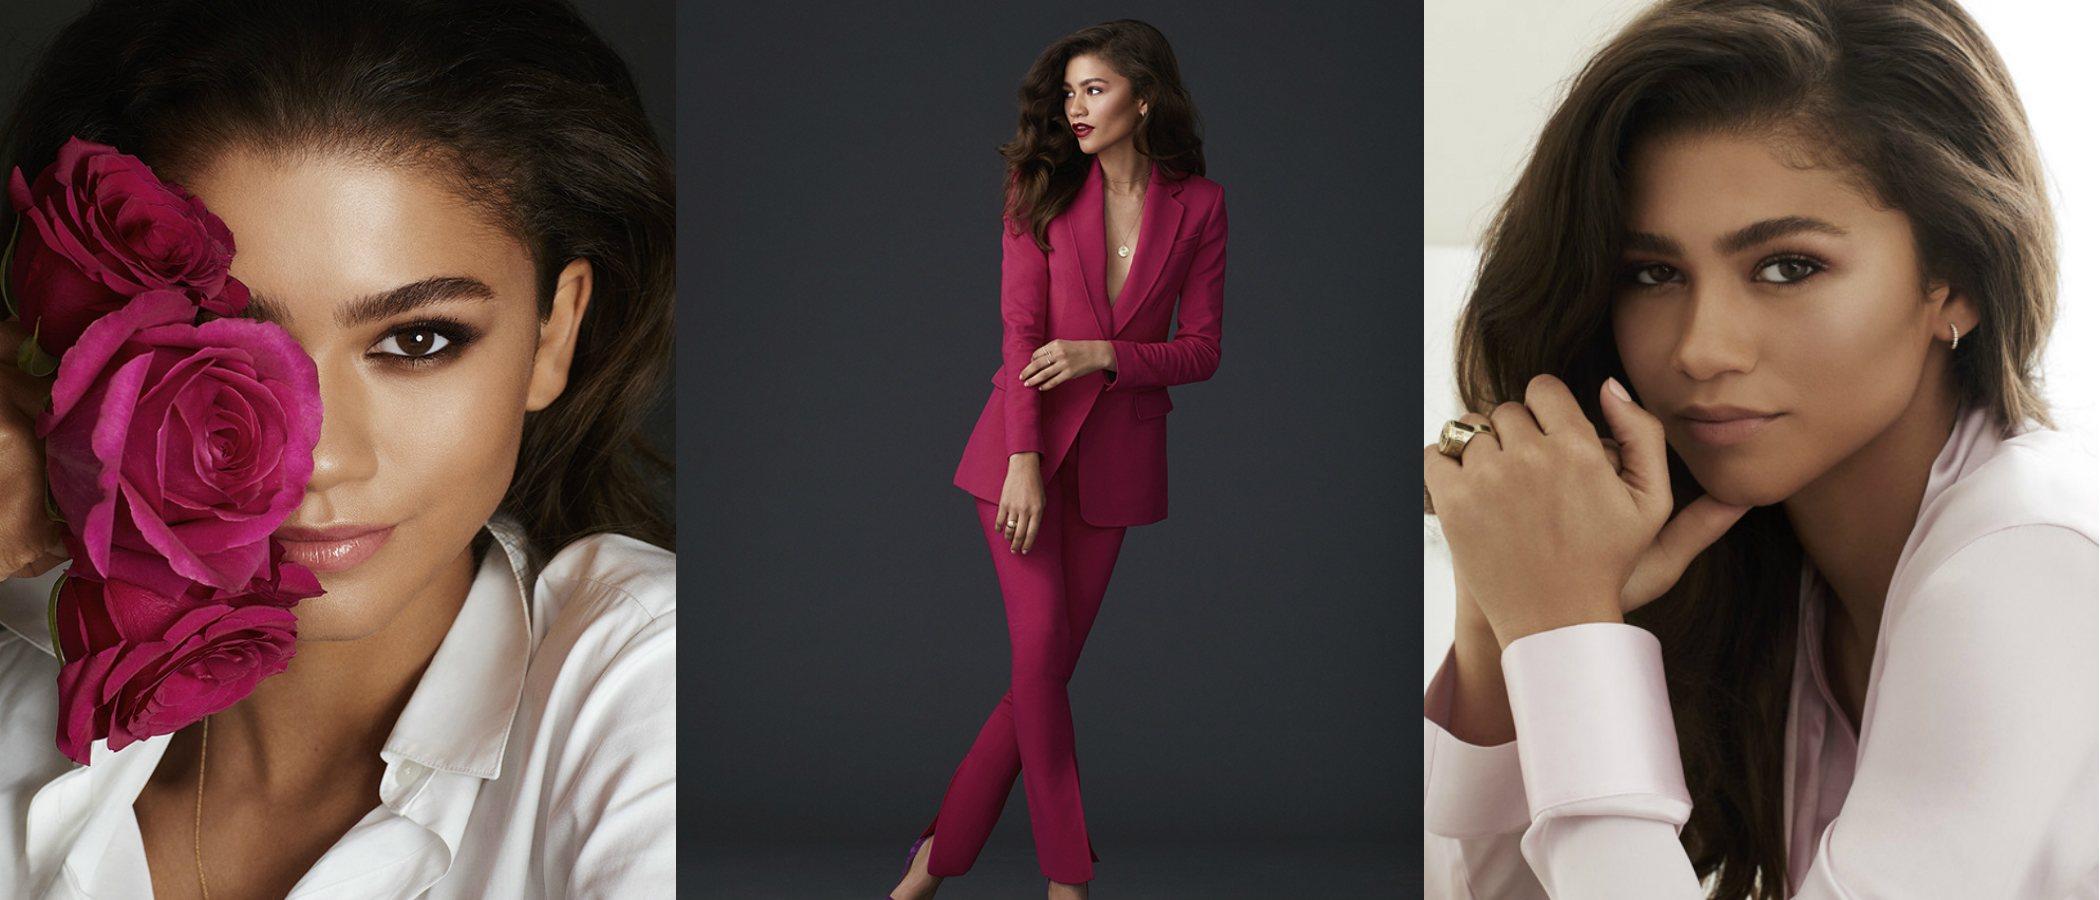 Zendaya se convierte en la nueva embajadora global de Lancôme